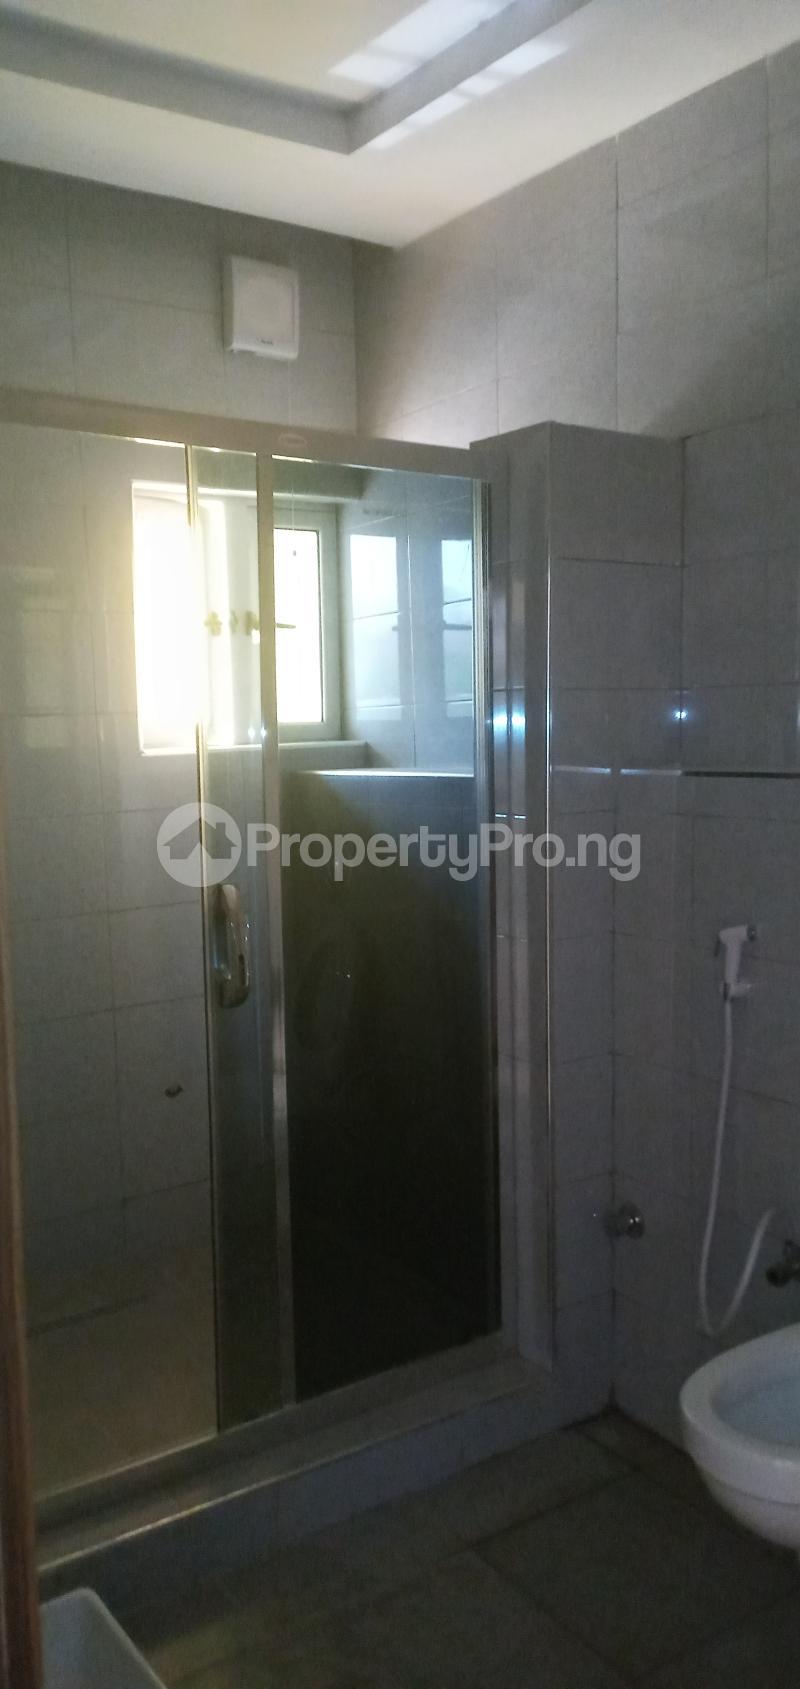 4 bedroom Terraced Duplex House for sale Close To Nnpc Guzape Guzape Abuja - 7